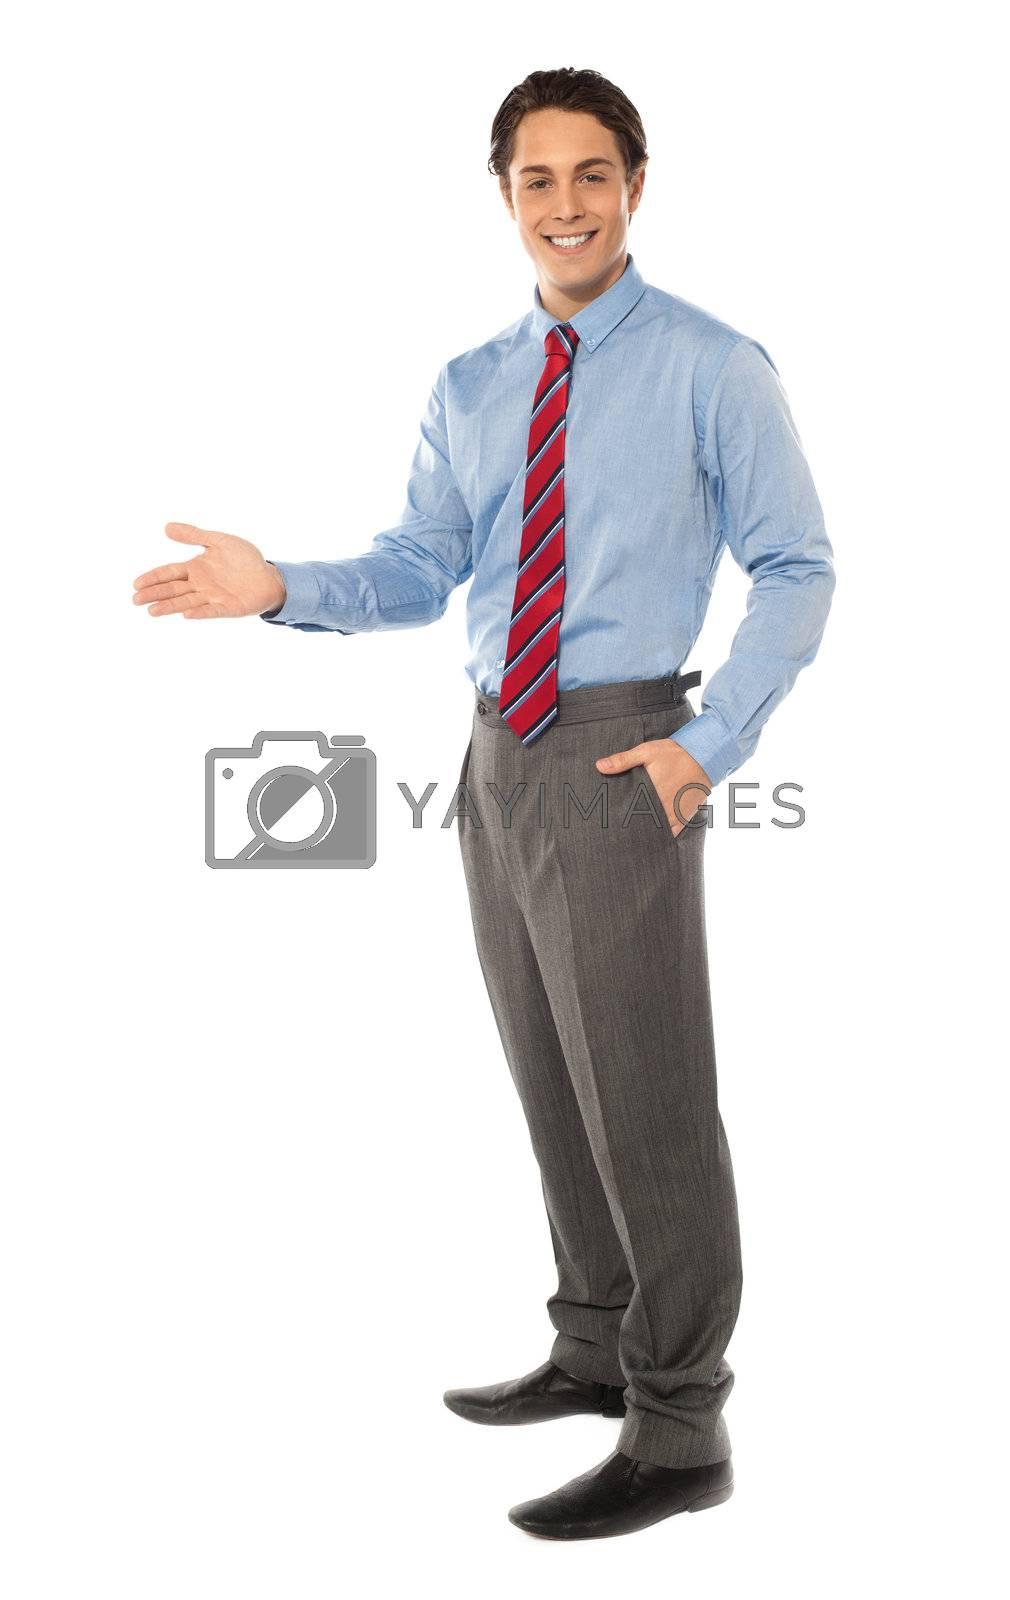 Stylish corporate gentleman posing, offering handshake